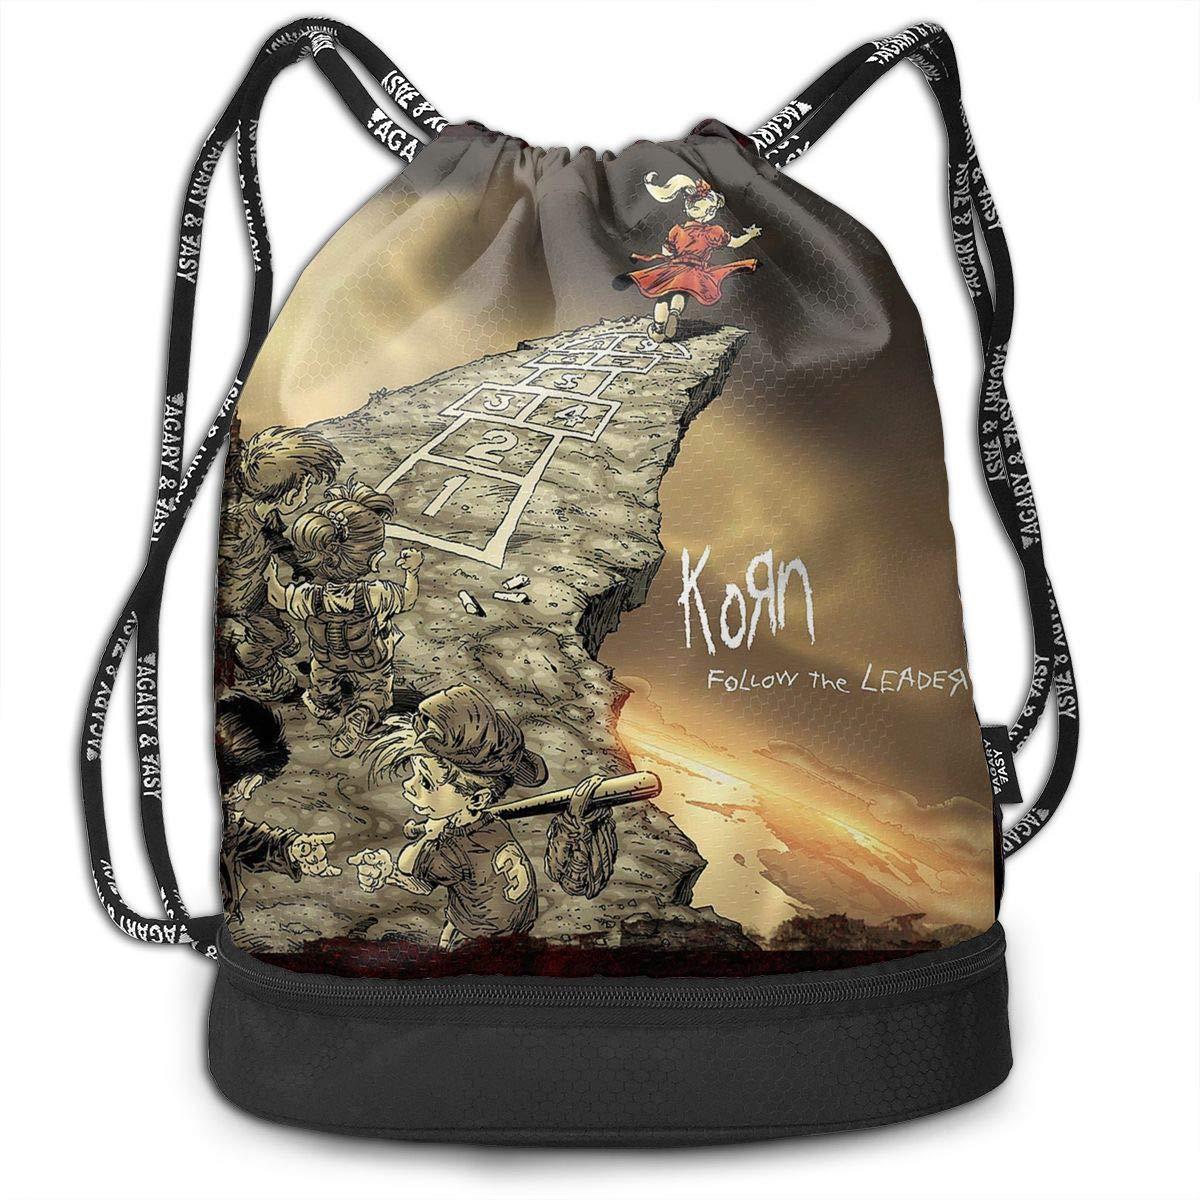 MeredithBush Korn 音楽バンドバンドバンドル バックパック キャンプバッグ メンズ/レディース キッズ用 B07NPJQND1